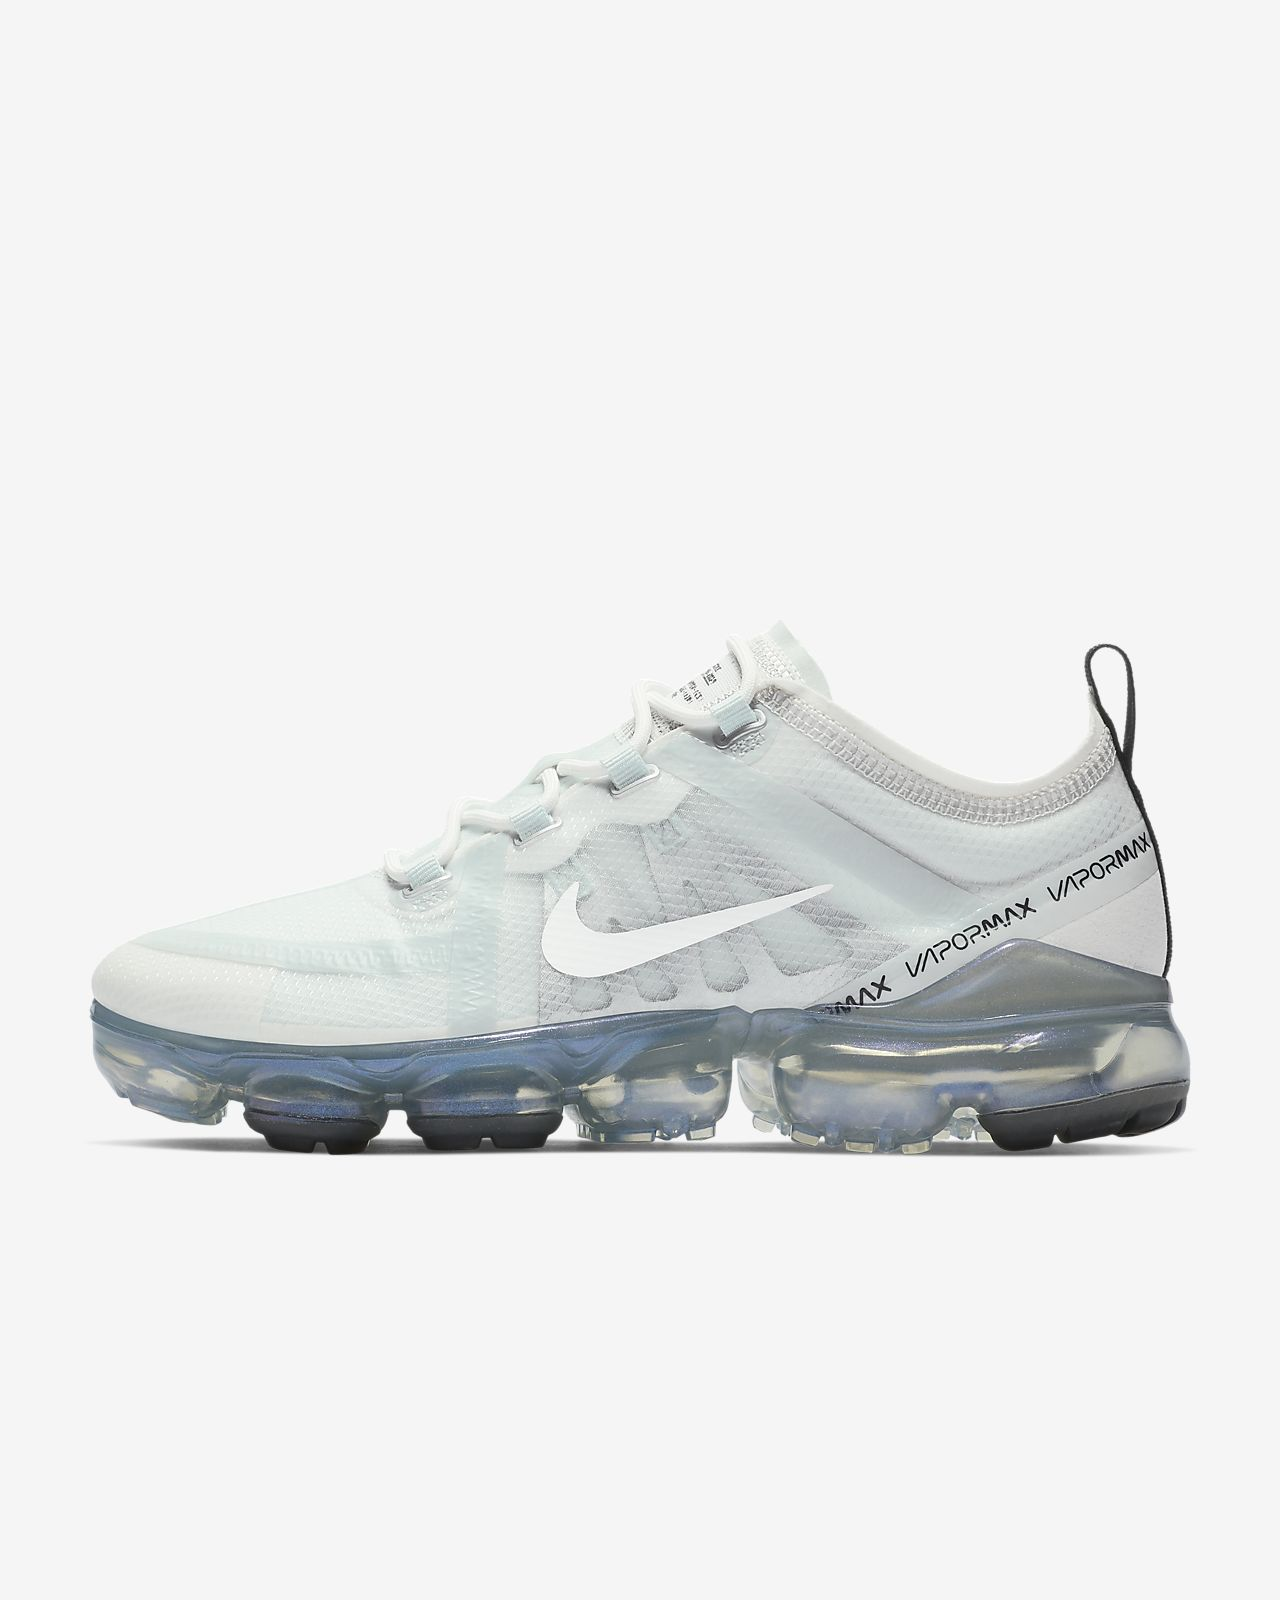 Nike Air VaporMax 2019 Kadın Ayakkabısı